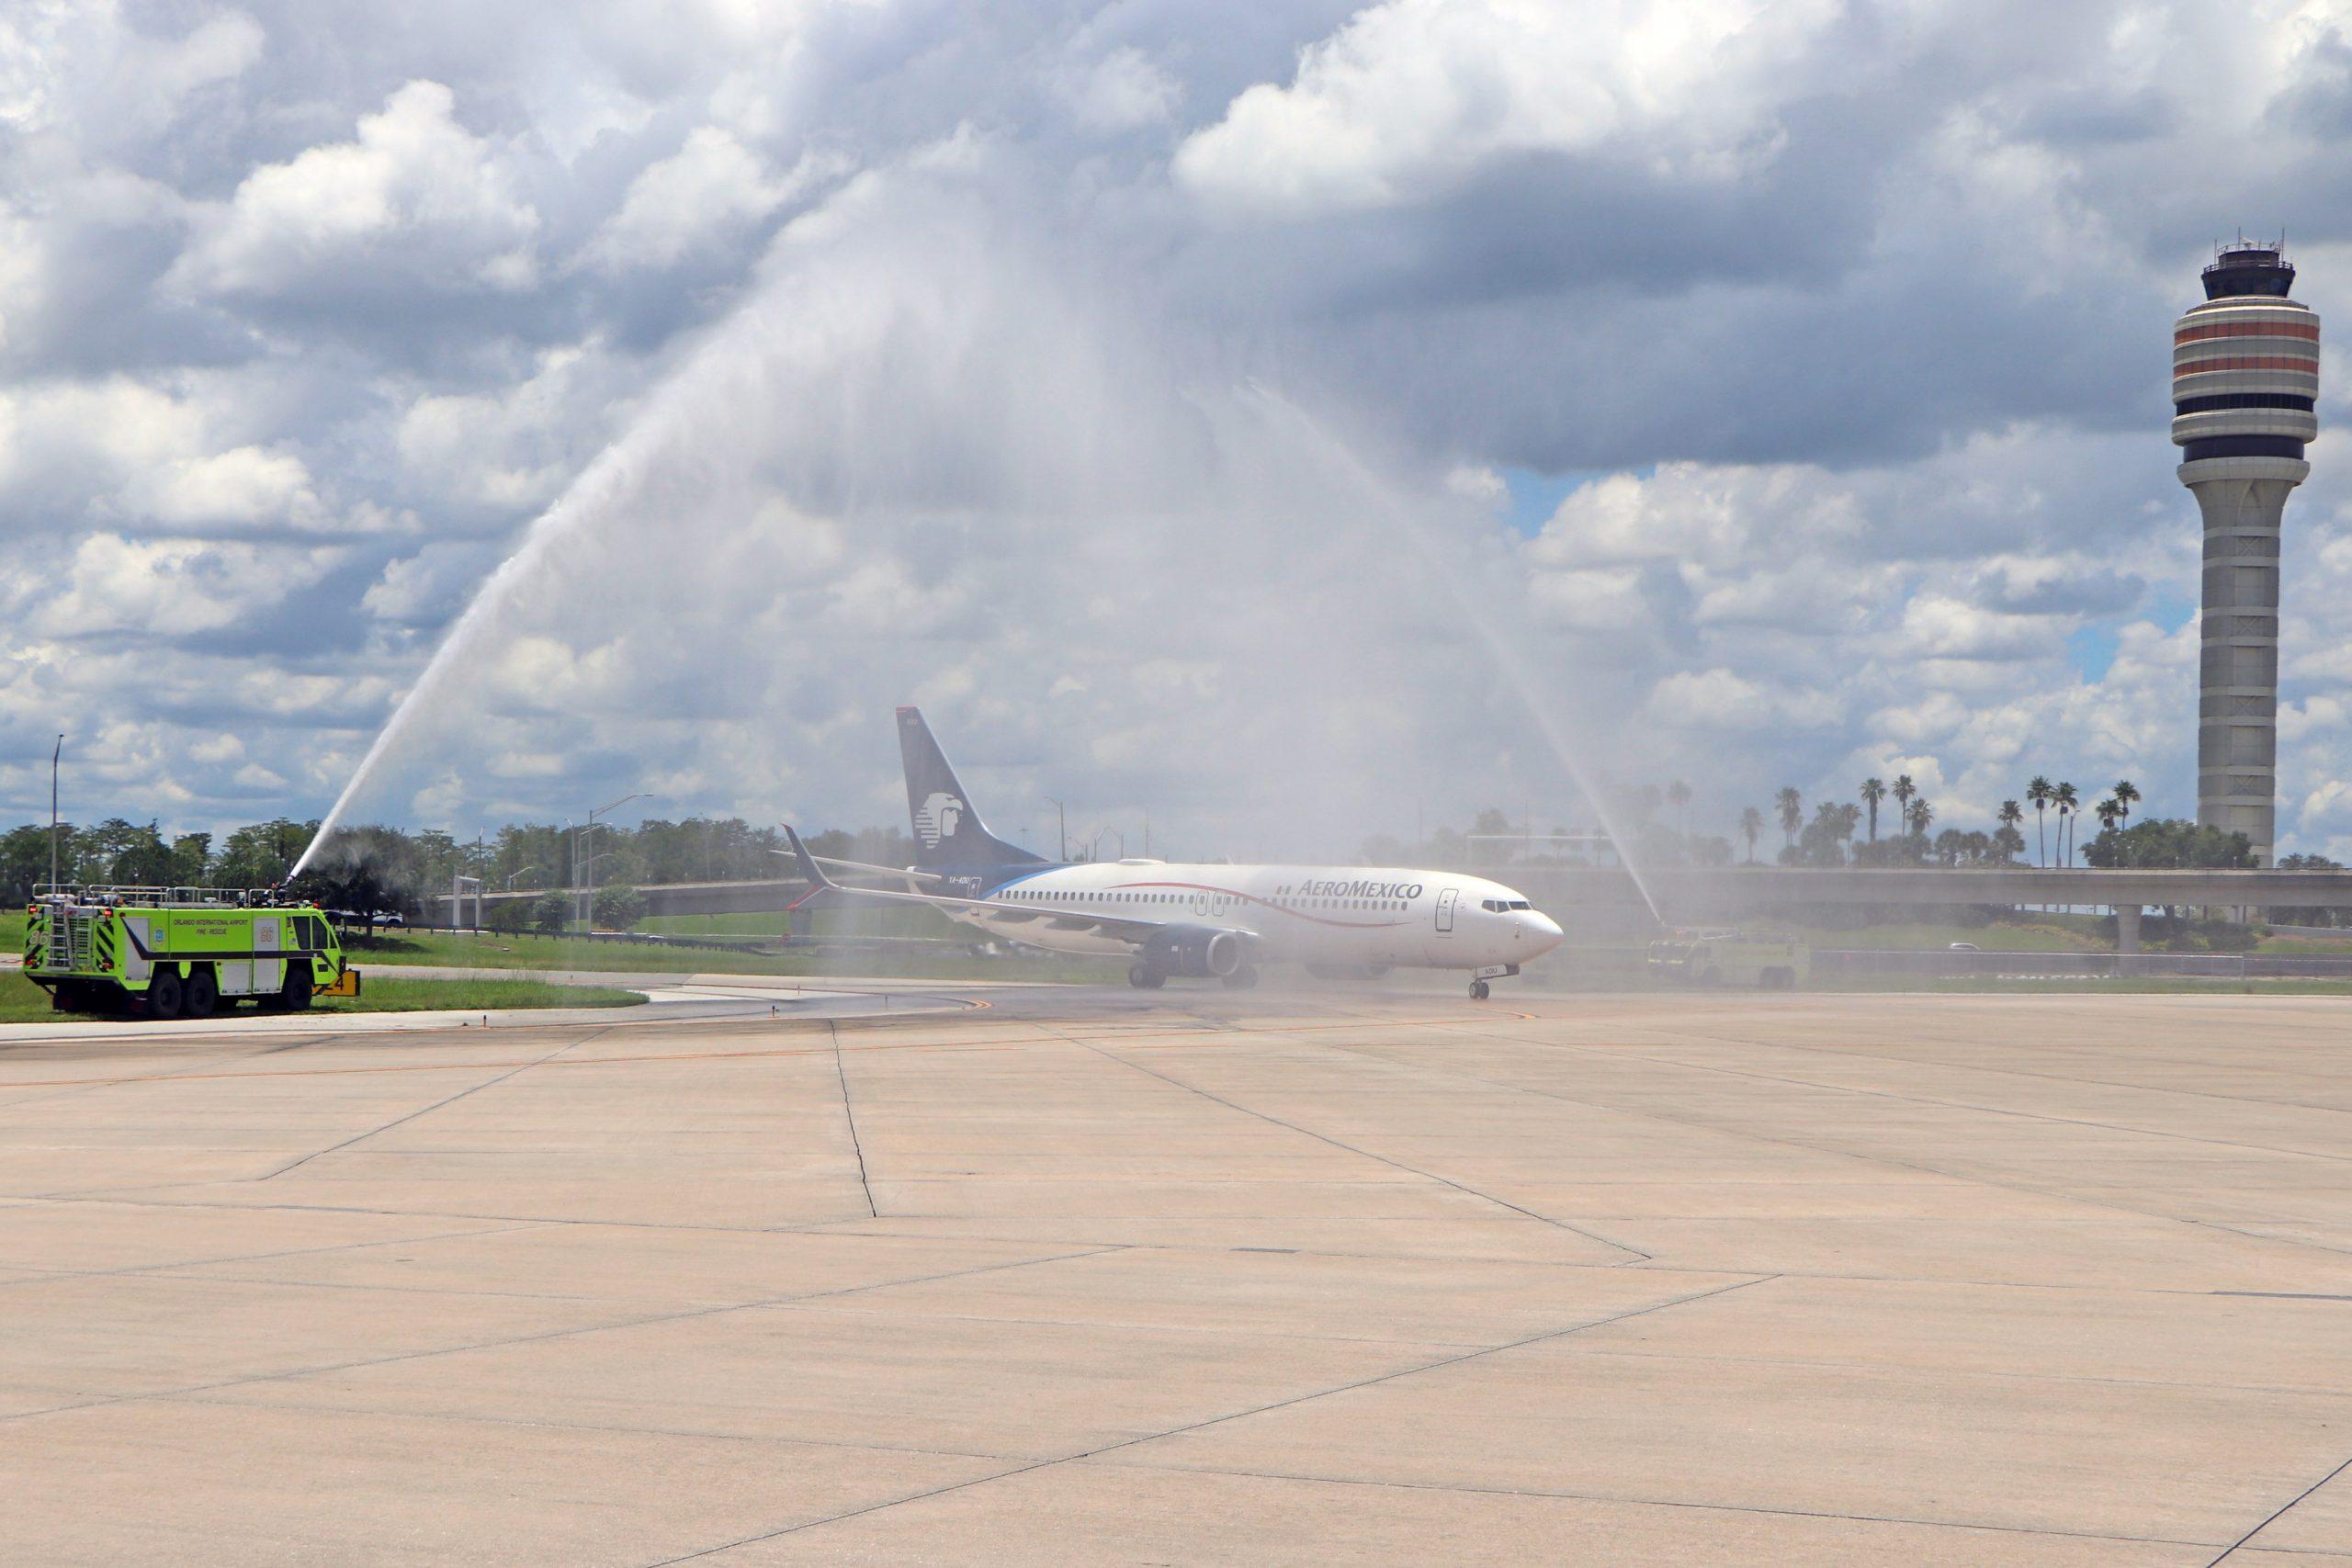 Water salute for AeroMexico's return to Orlando International Airport